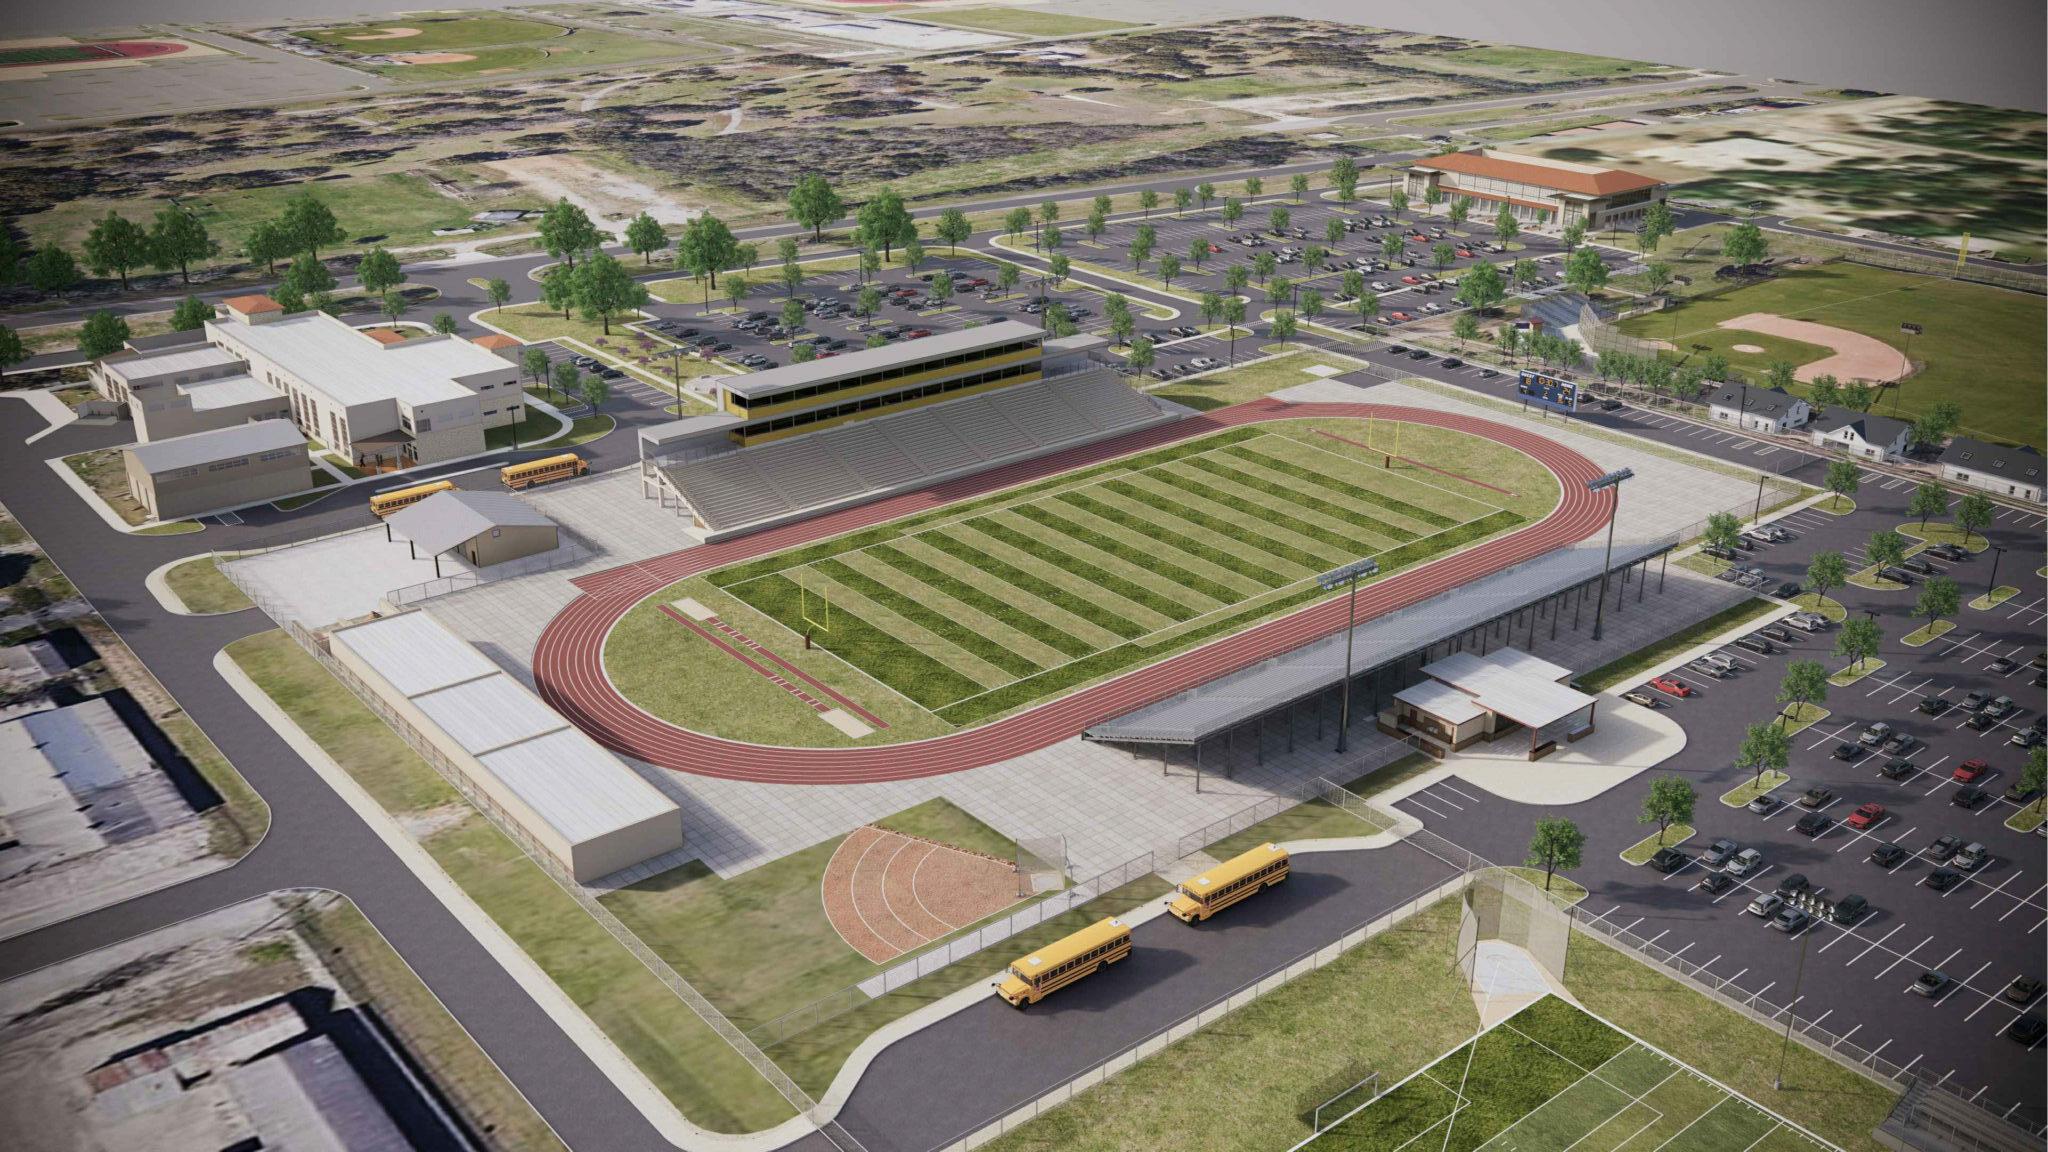 Harlandale ISD Renovations Stadium Rendering